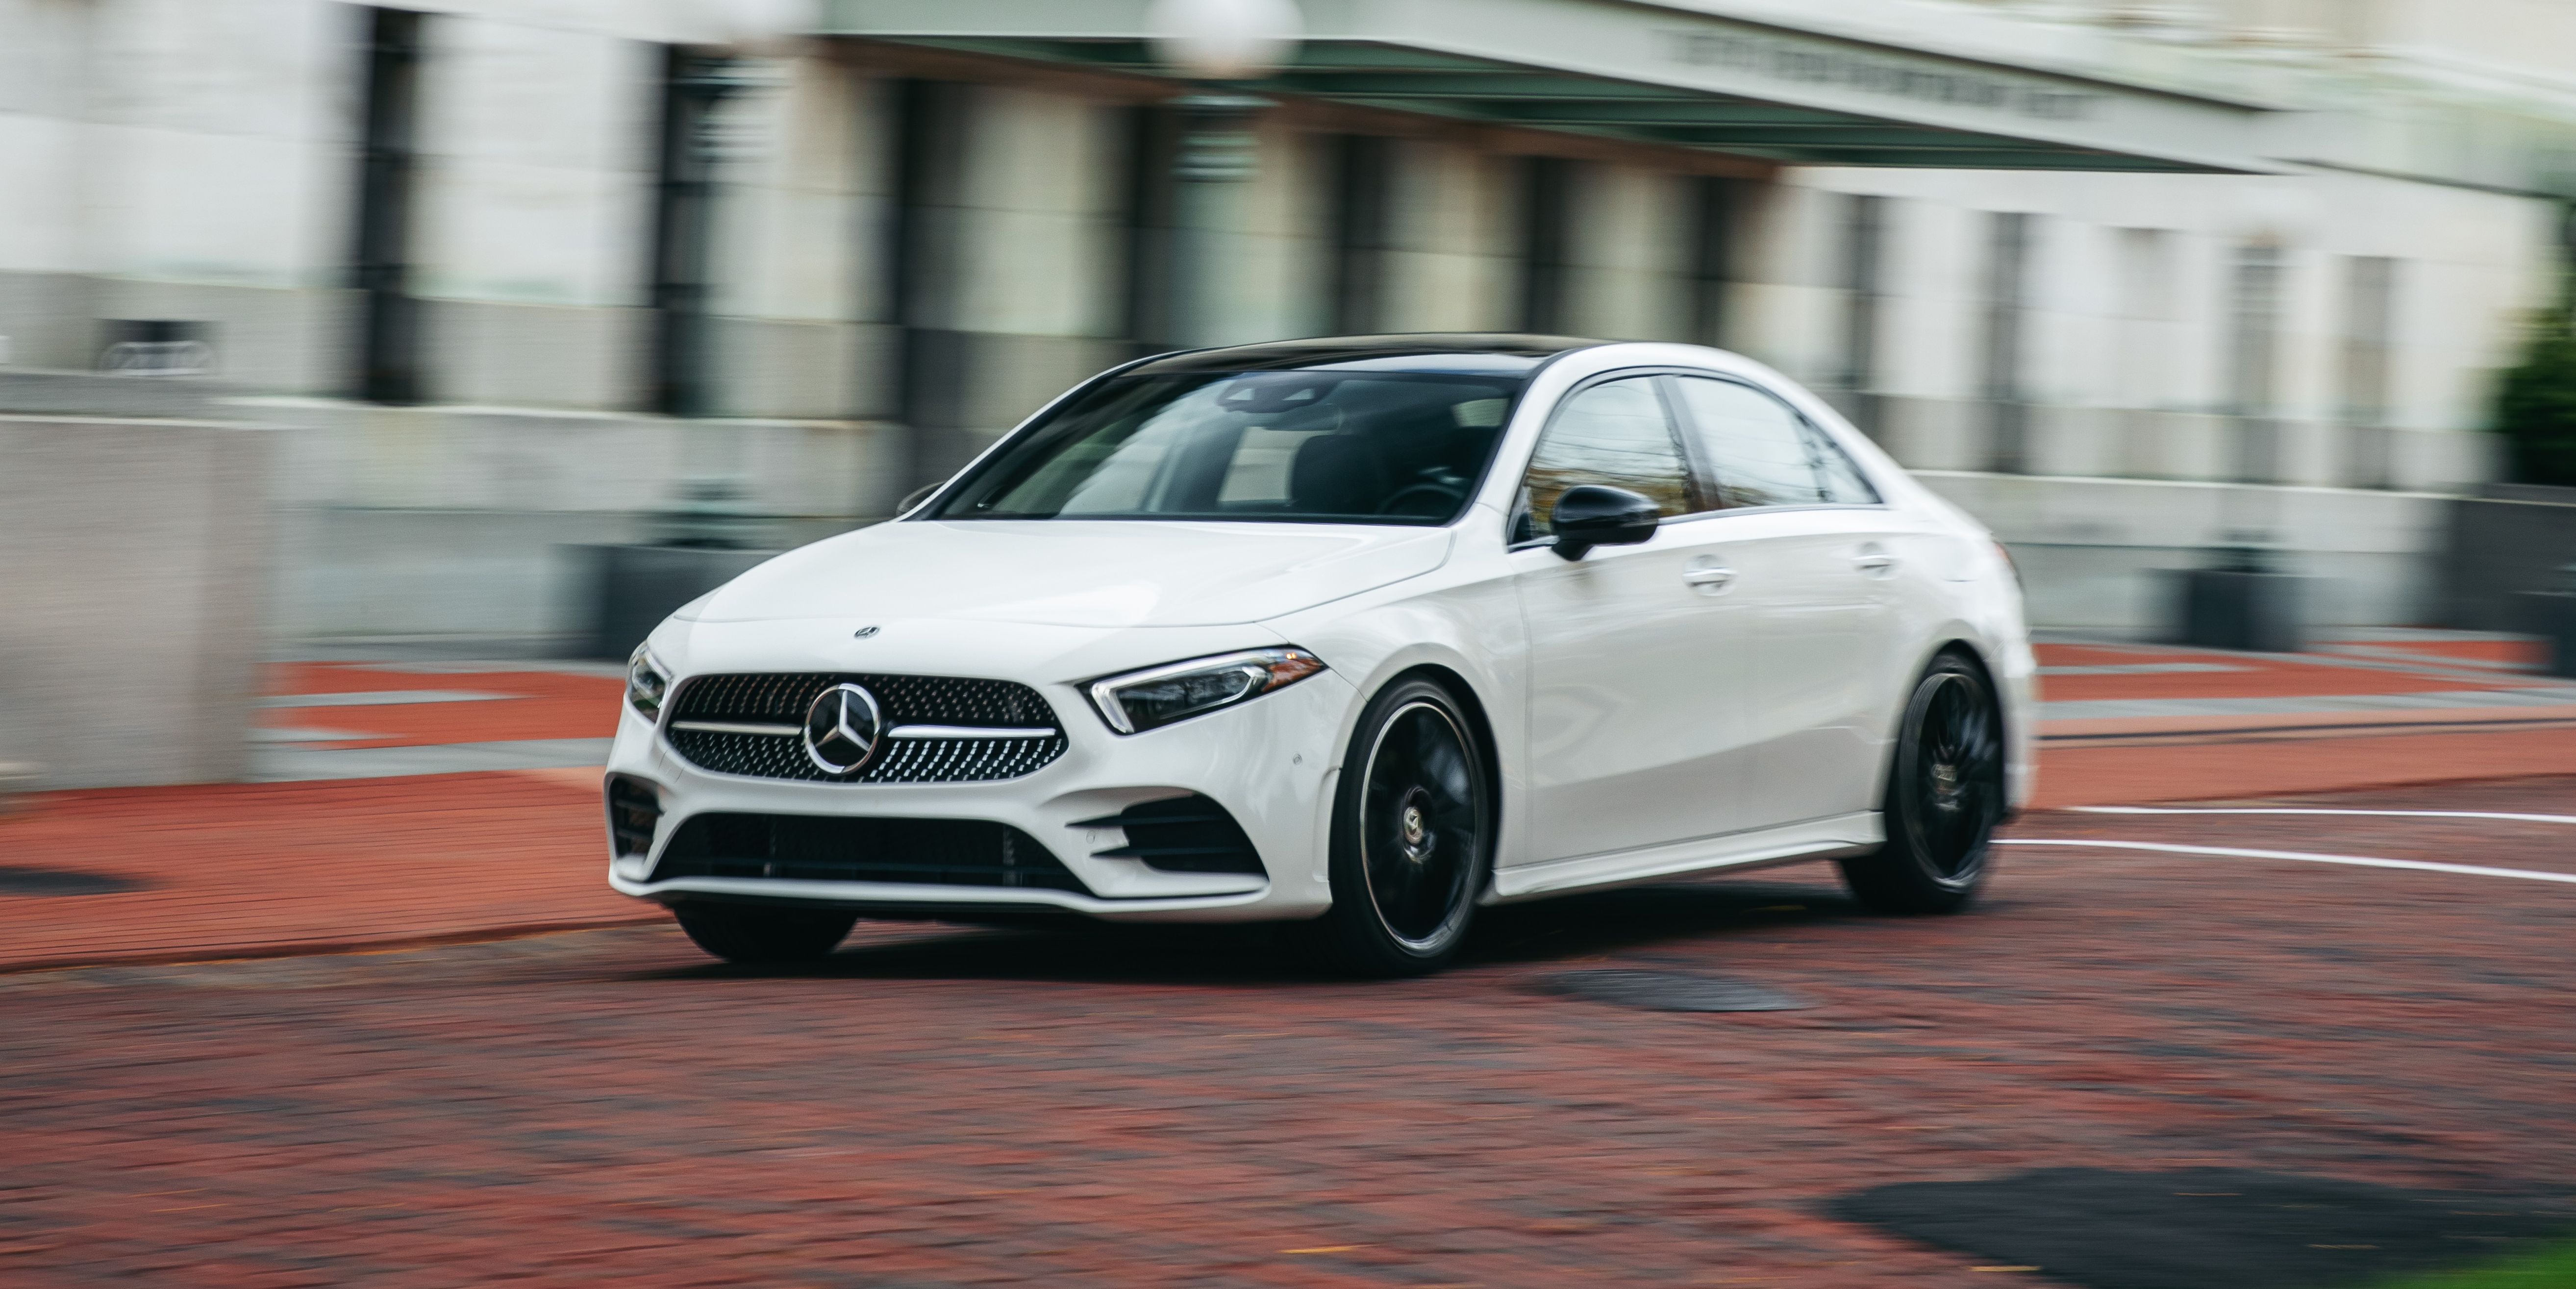 The 2019 Mercedes Benz A Class Is A Proper Sedan And A